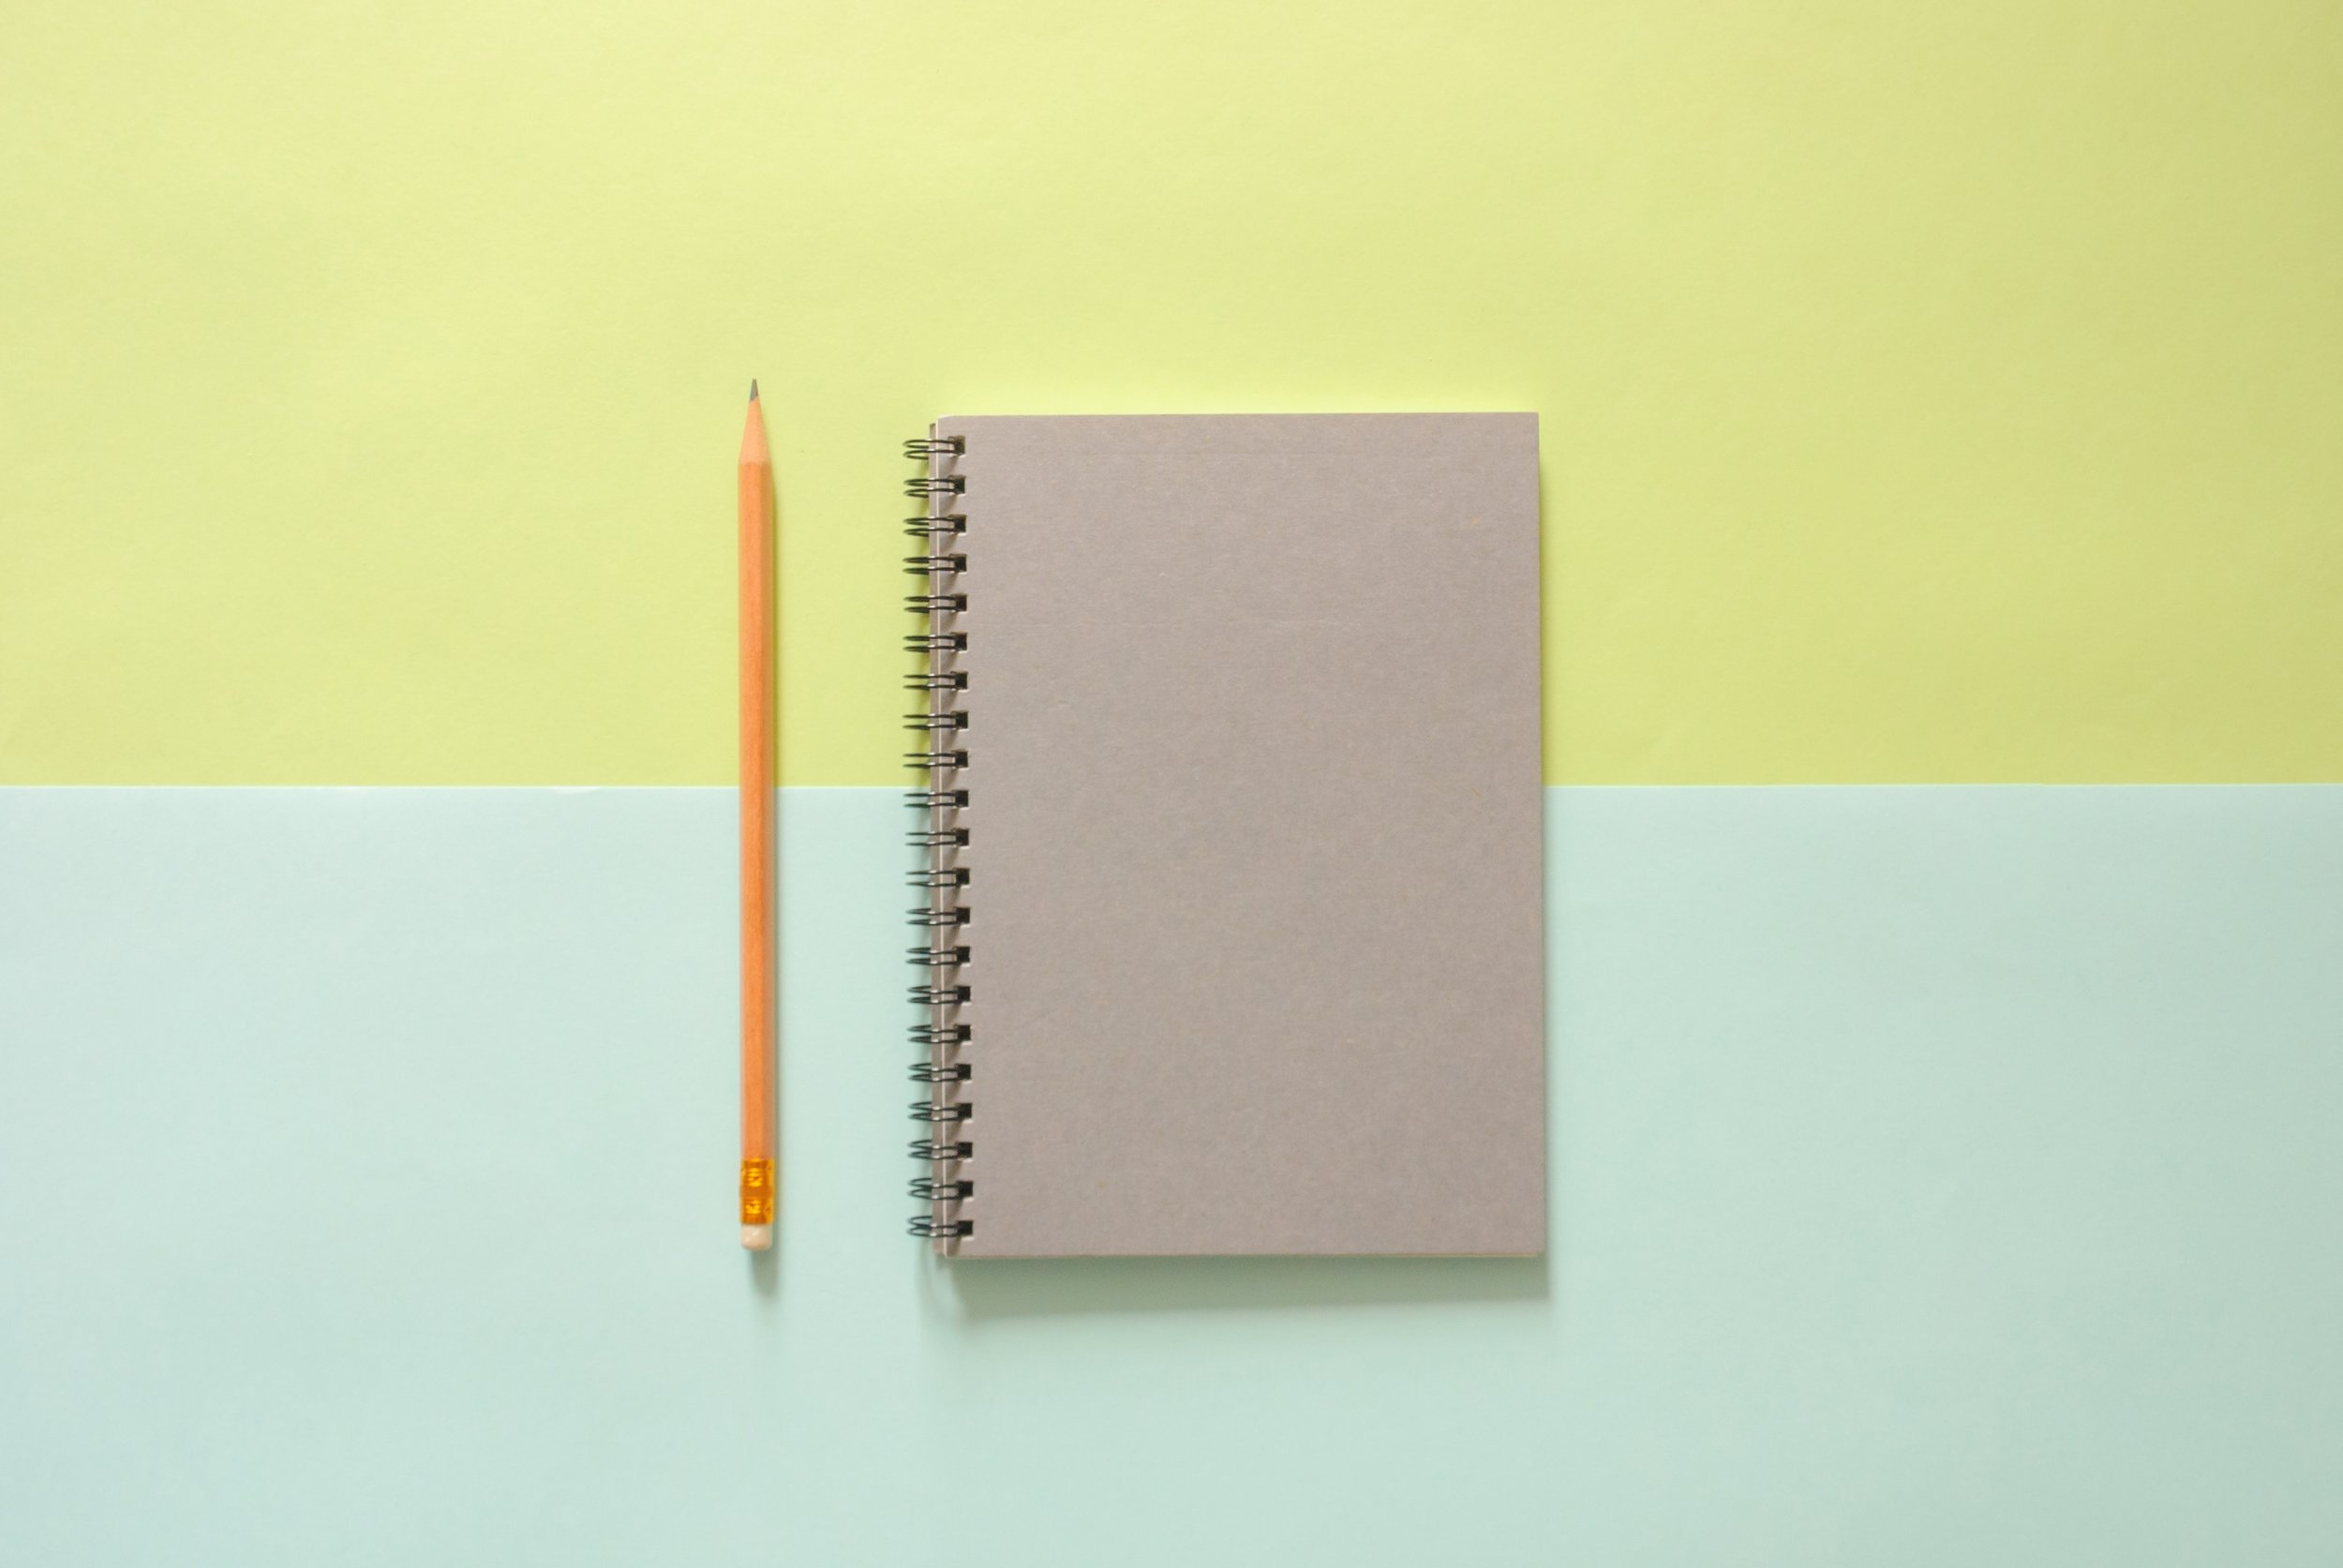 background-notebook-pencil-544115.jpg